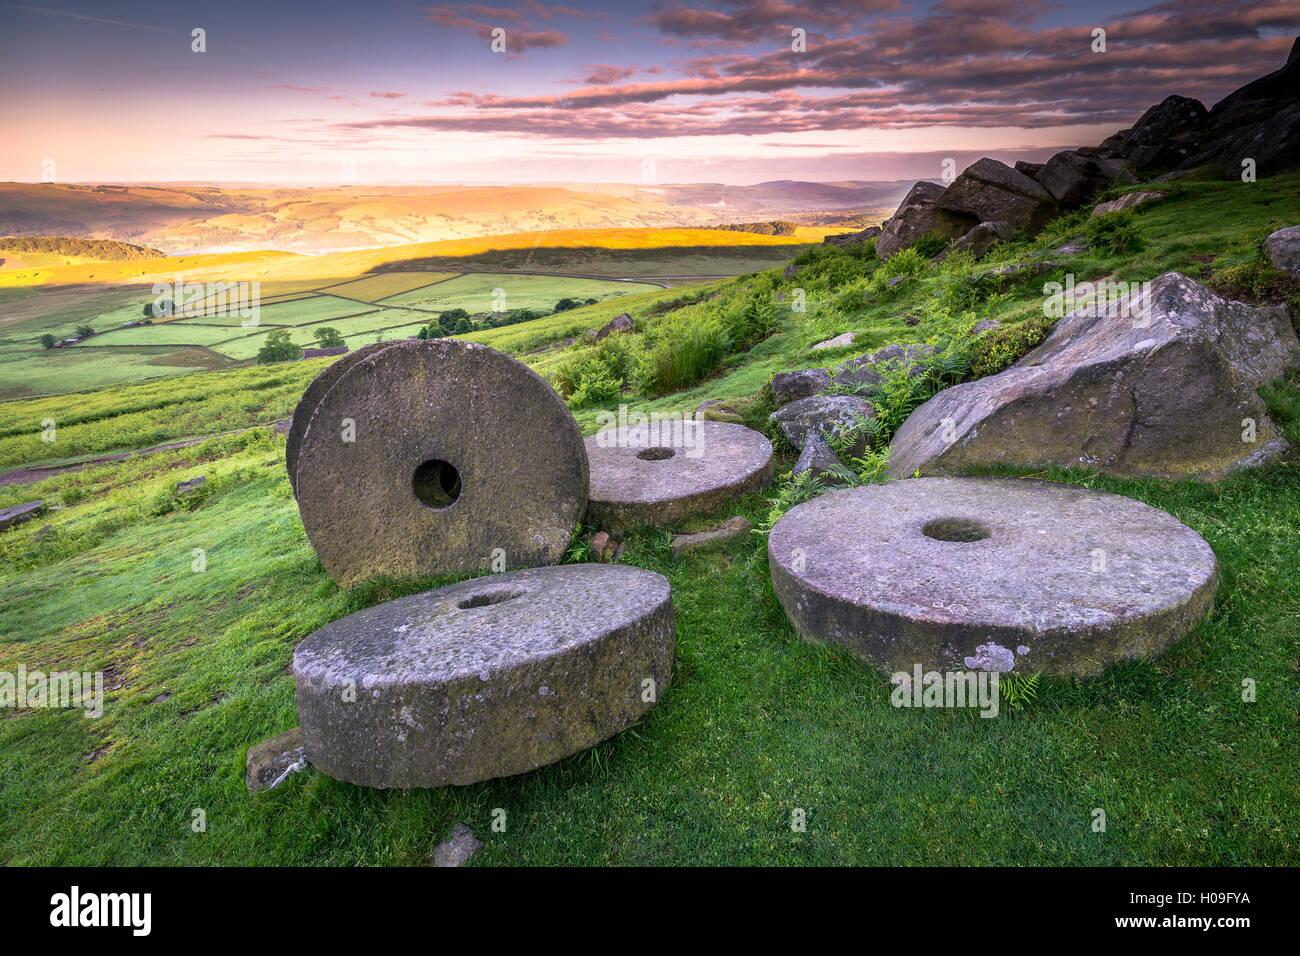 Stanage Edge millstones at sunrise, Peak District National Park, Derbyshire, England, United Kingdom, Europe - Stock Image